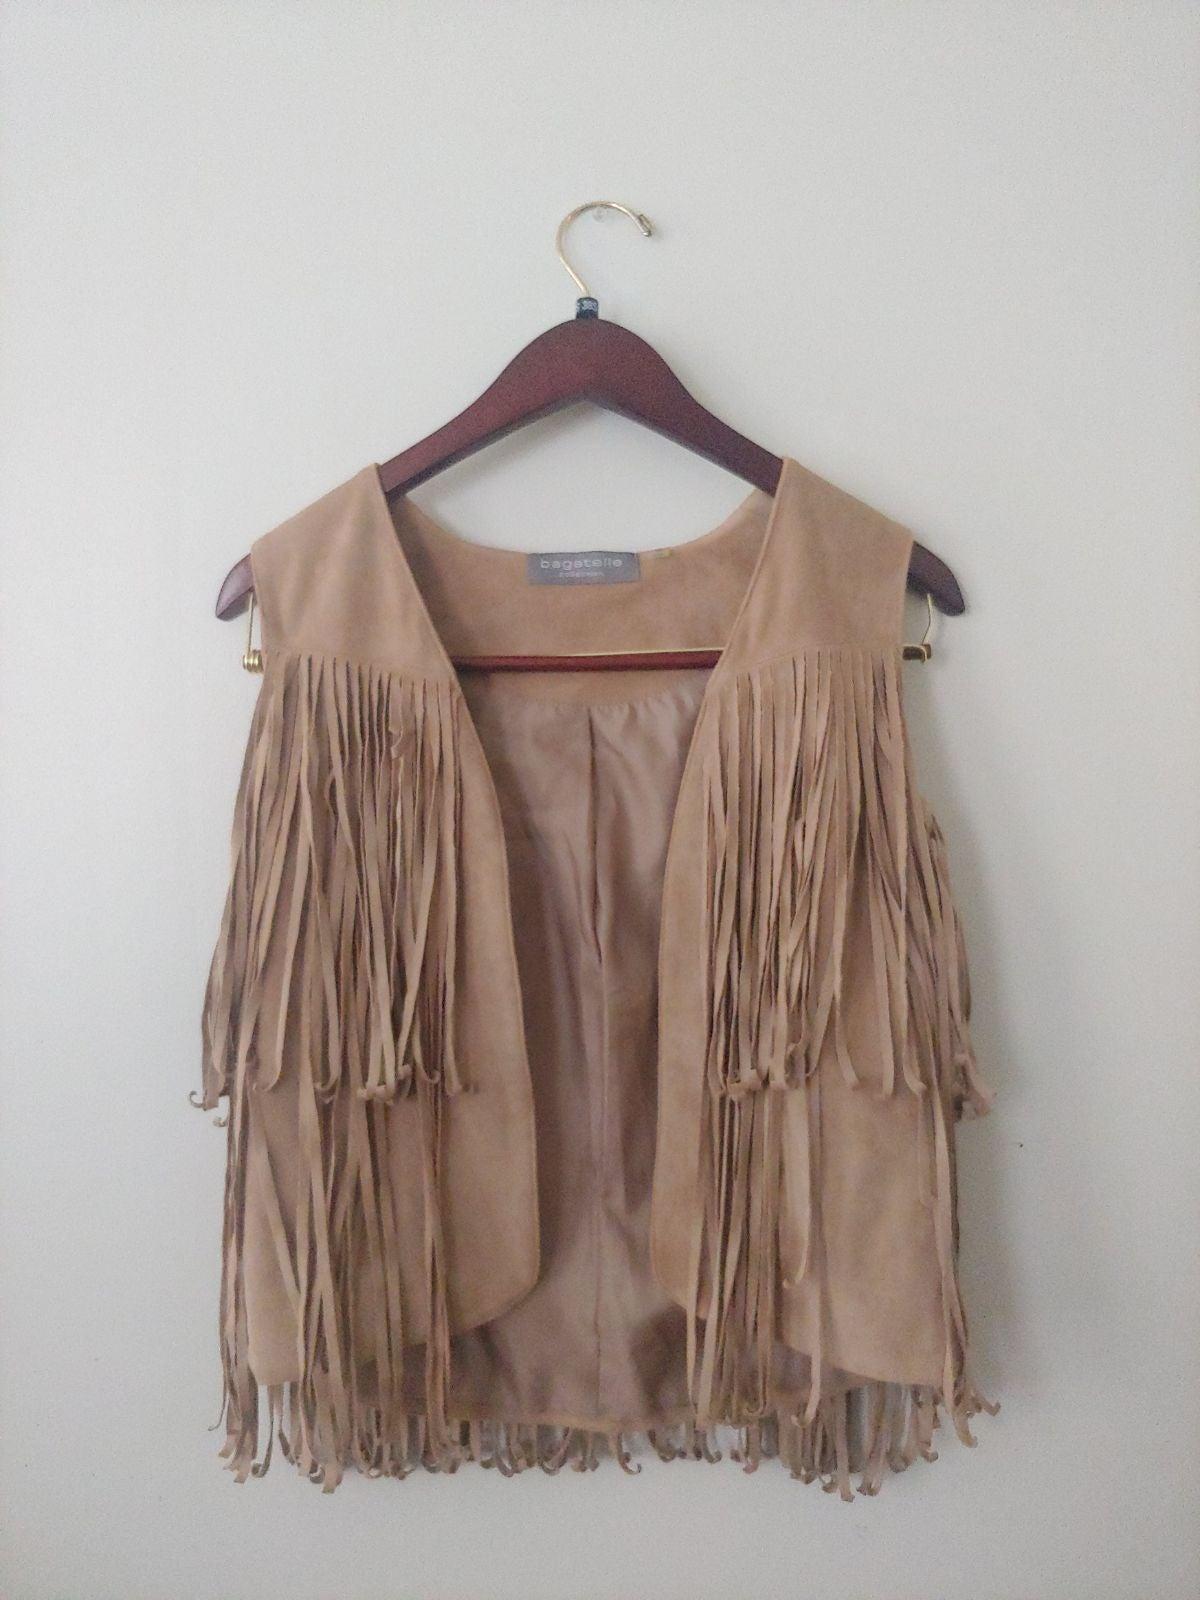 Suede fringe vest women's small